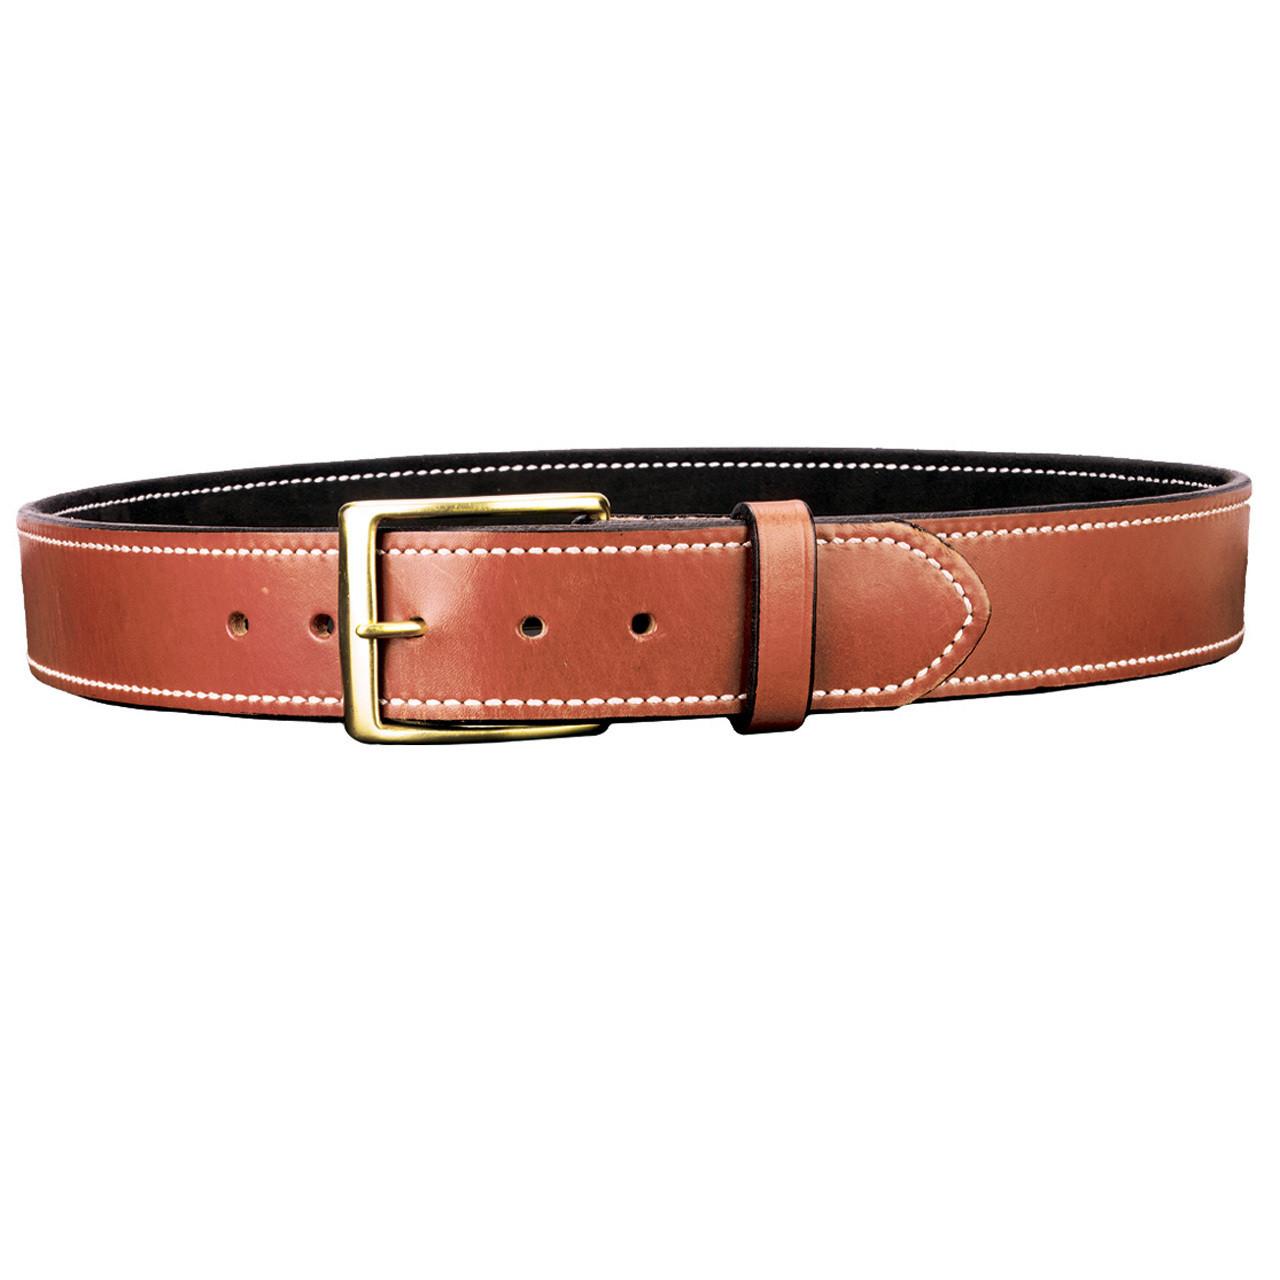 "1 1/2"" Belt"